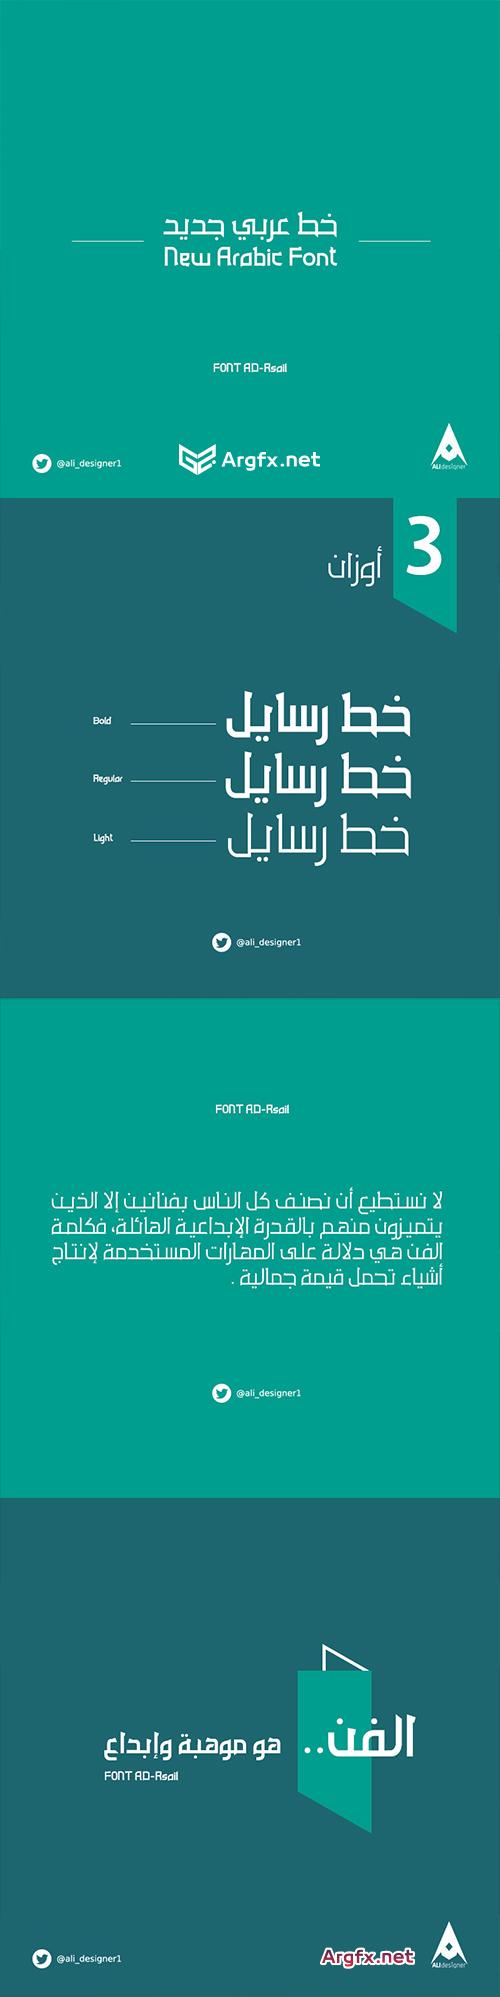 AD-Rsail - Arabic Typeface خط رسايل